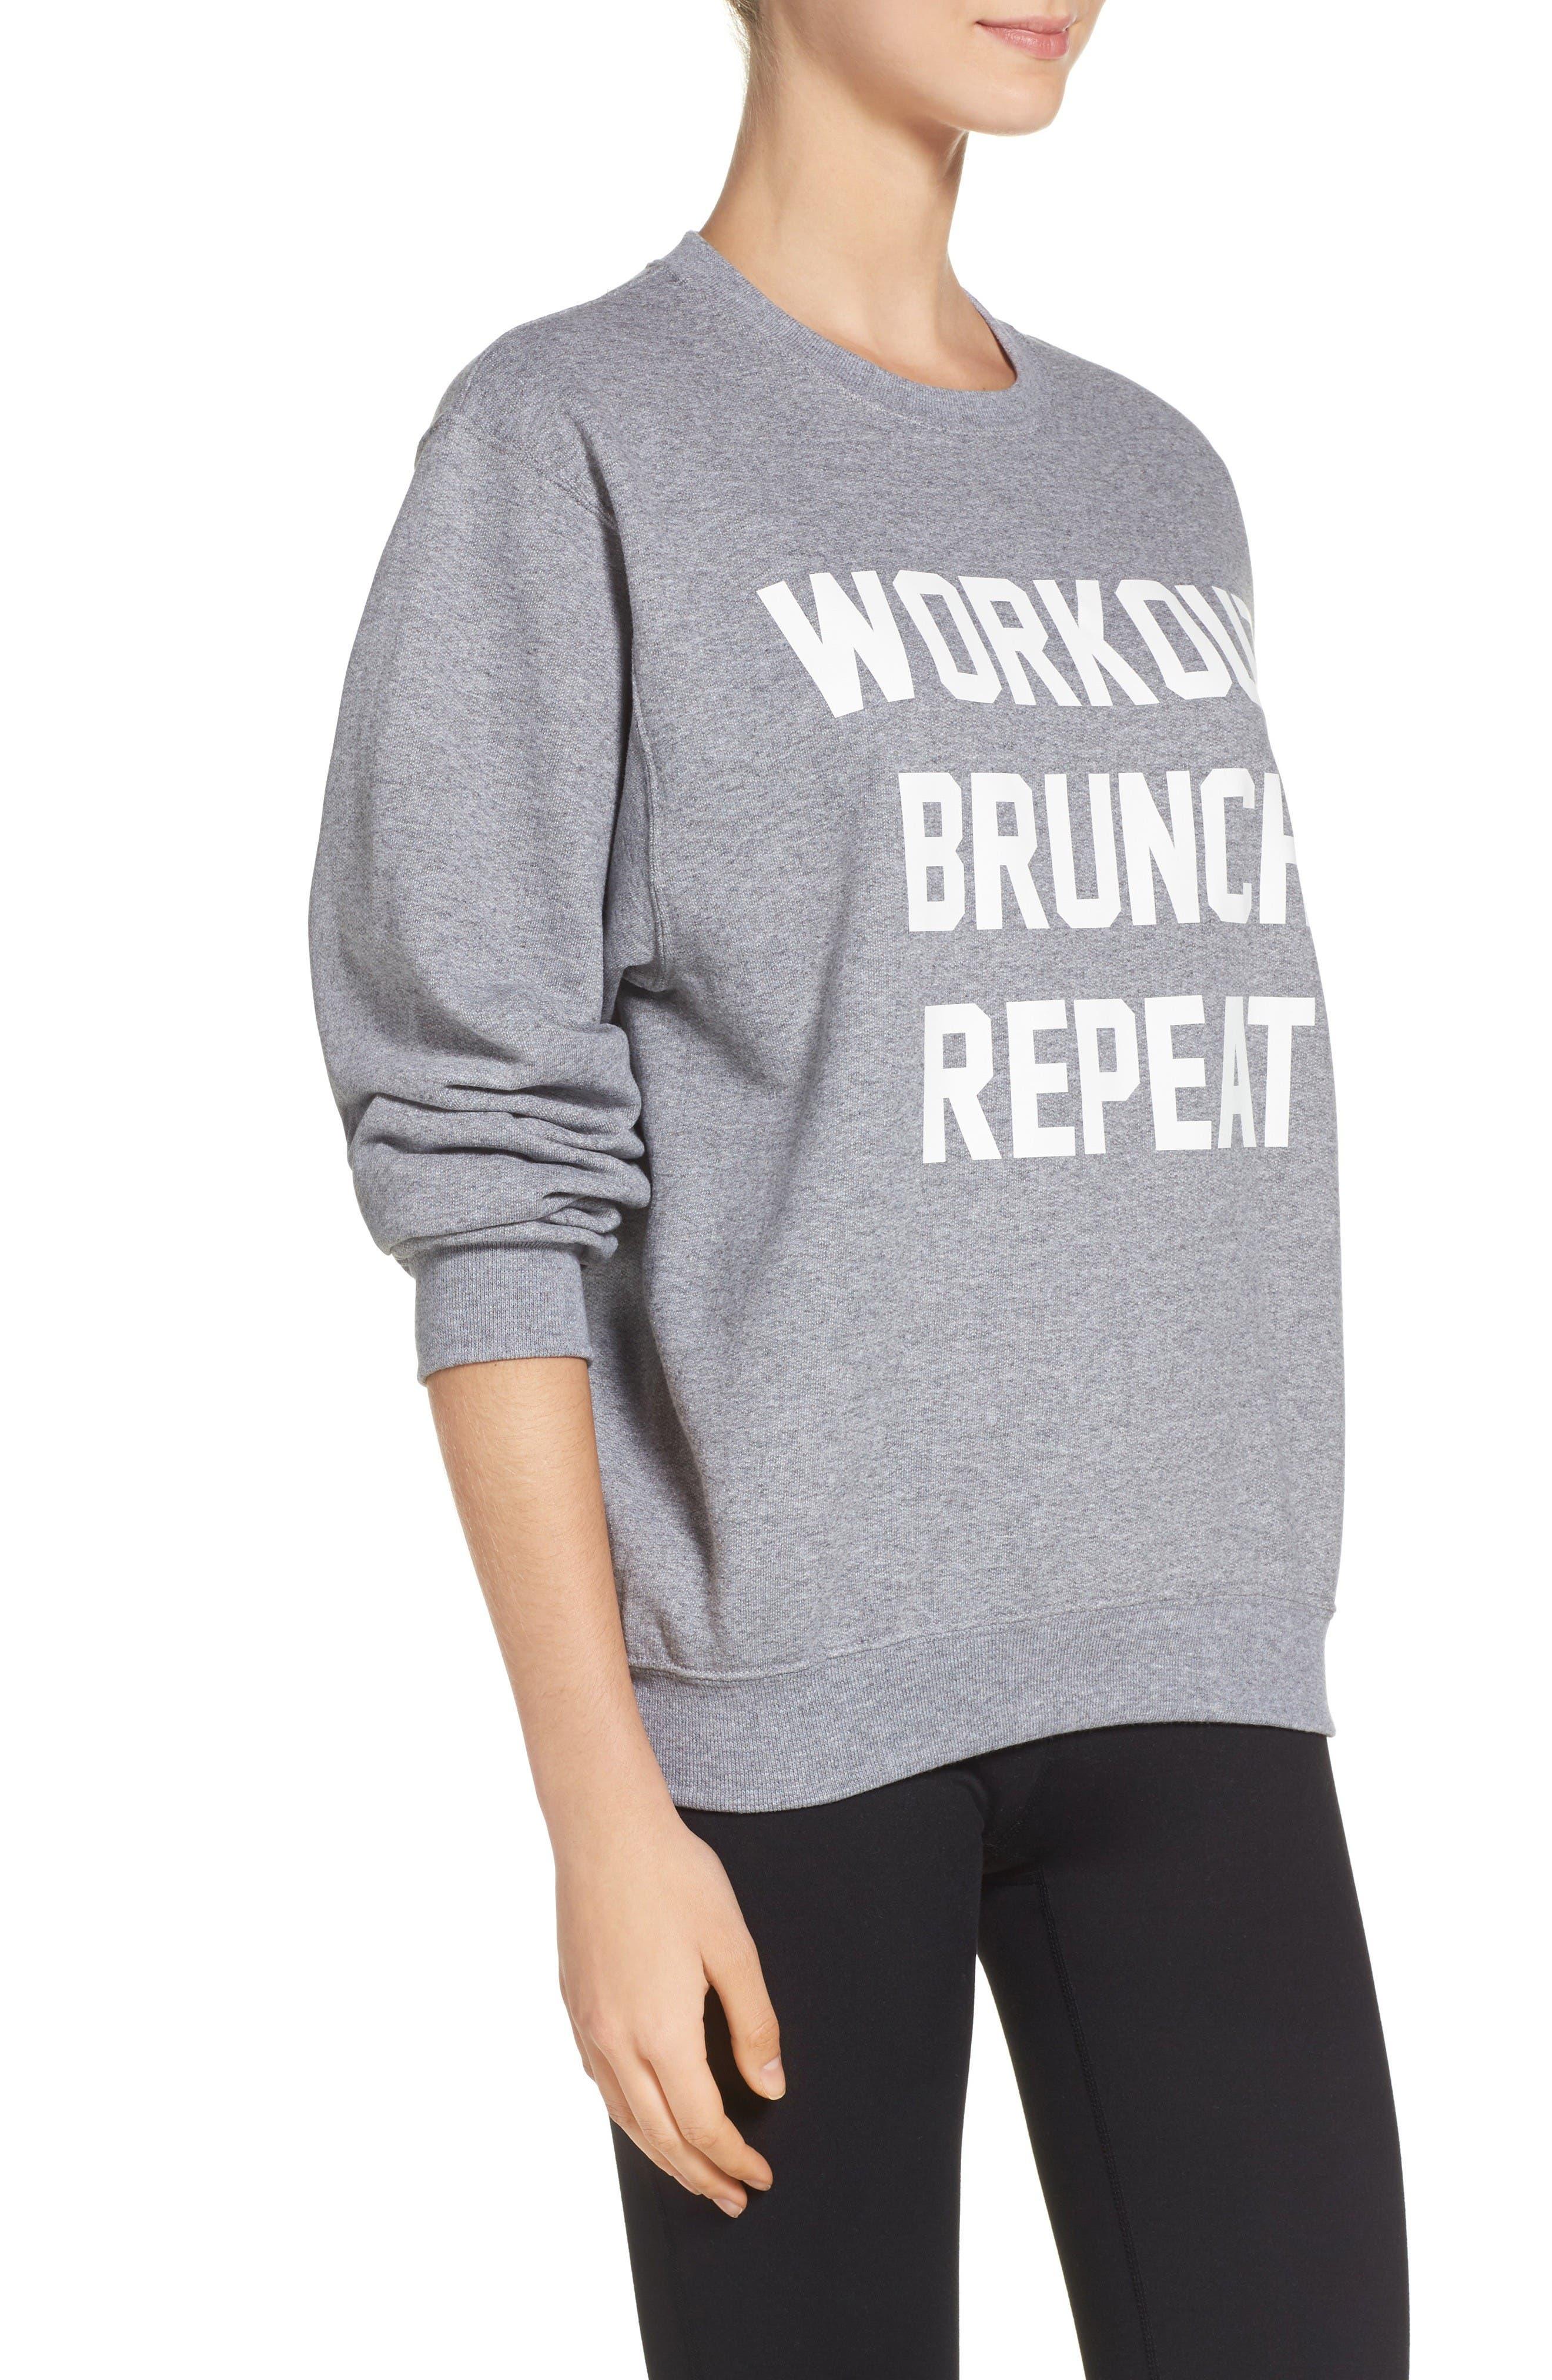 Workout Brunch Repeat Sweatshirt,                             Alternate thumbnail 3, color,                             Grey